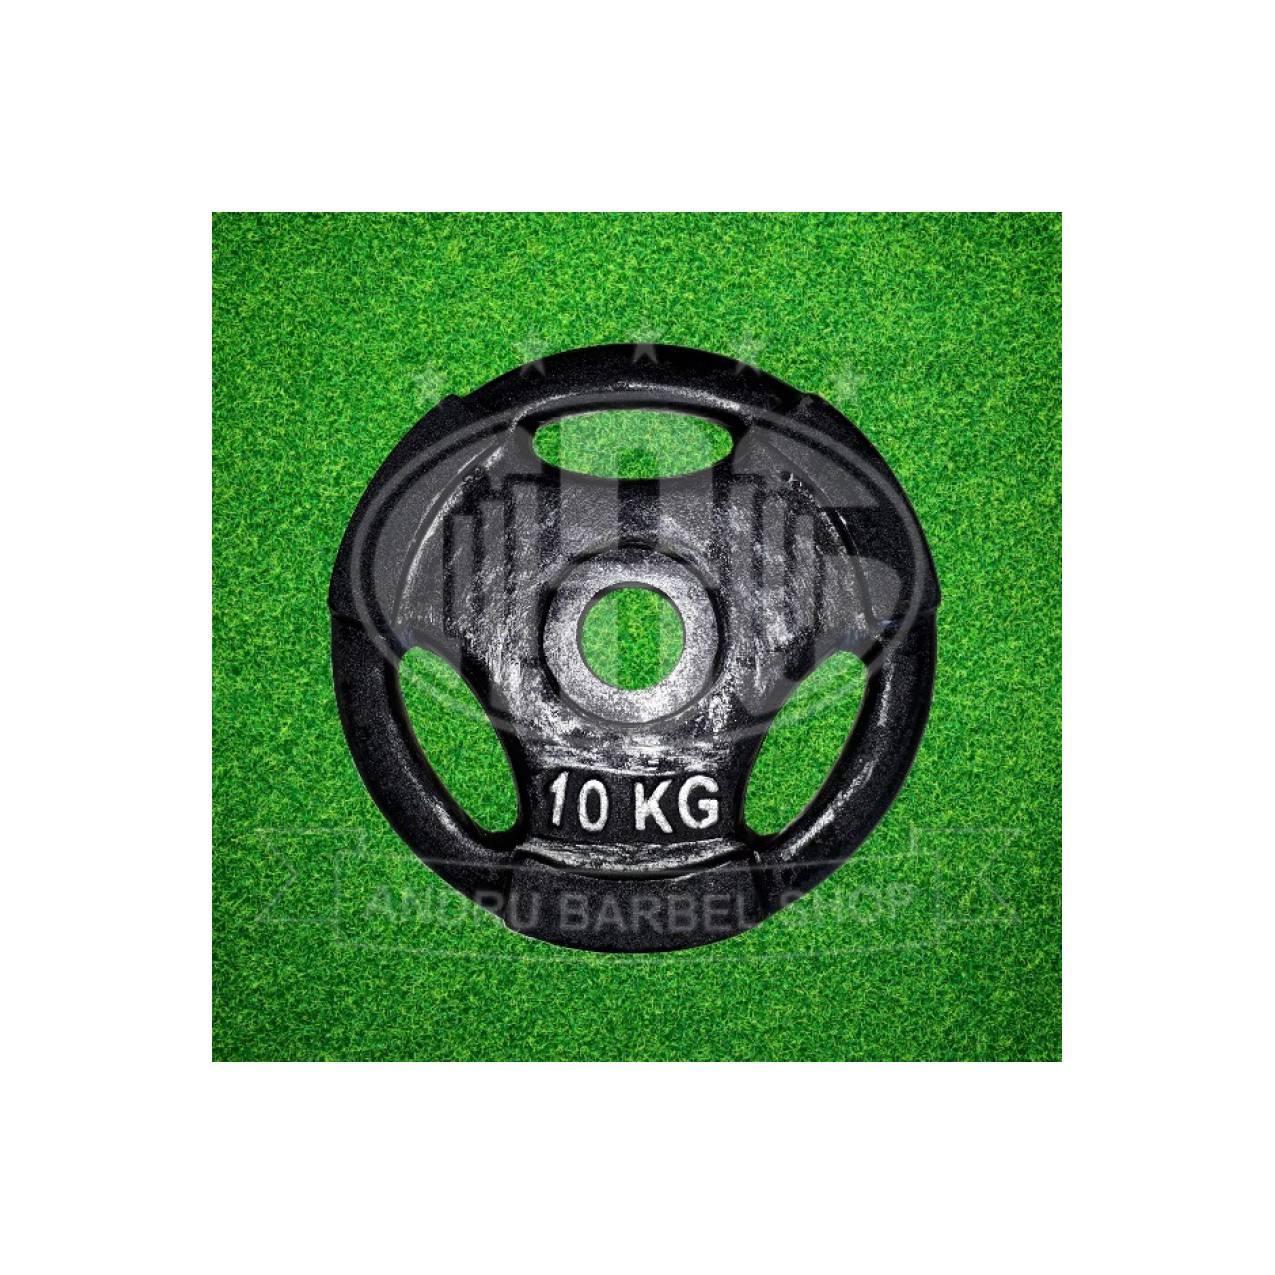 olympic plate 10kg (diameter 5cm)